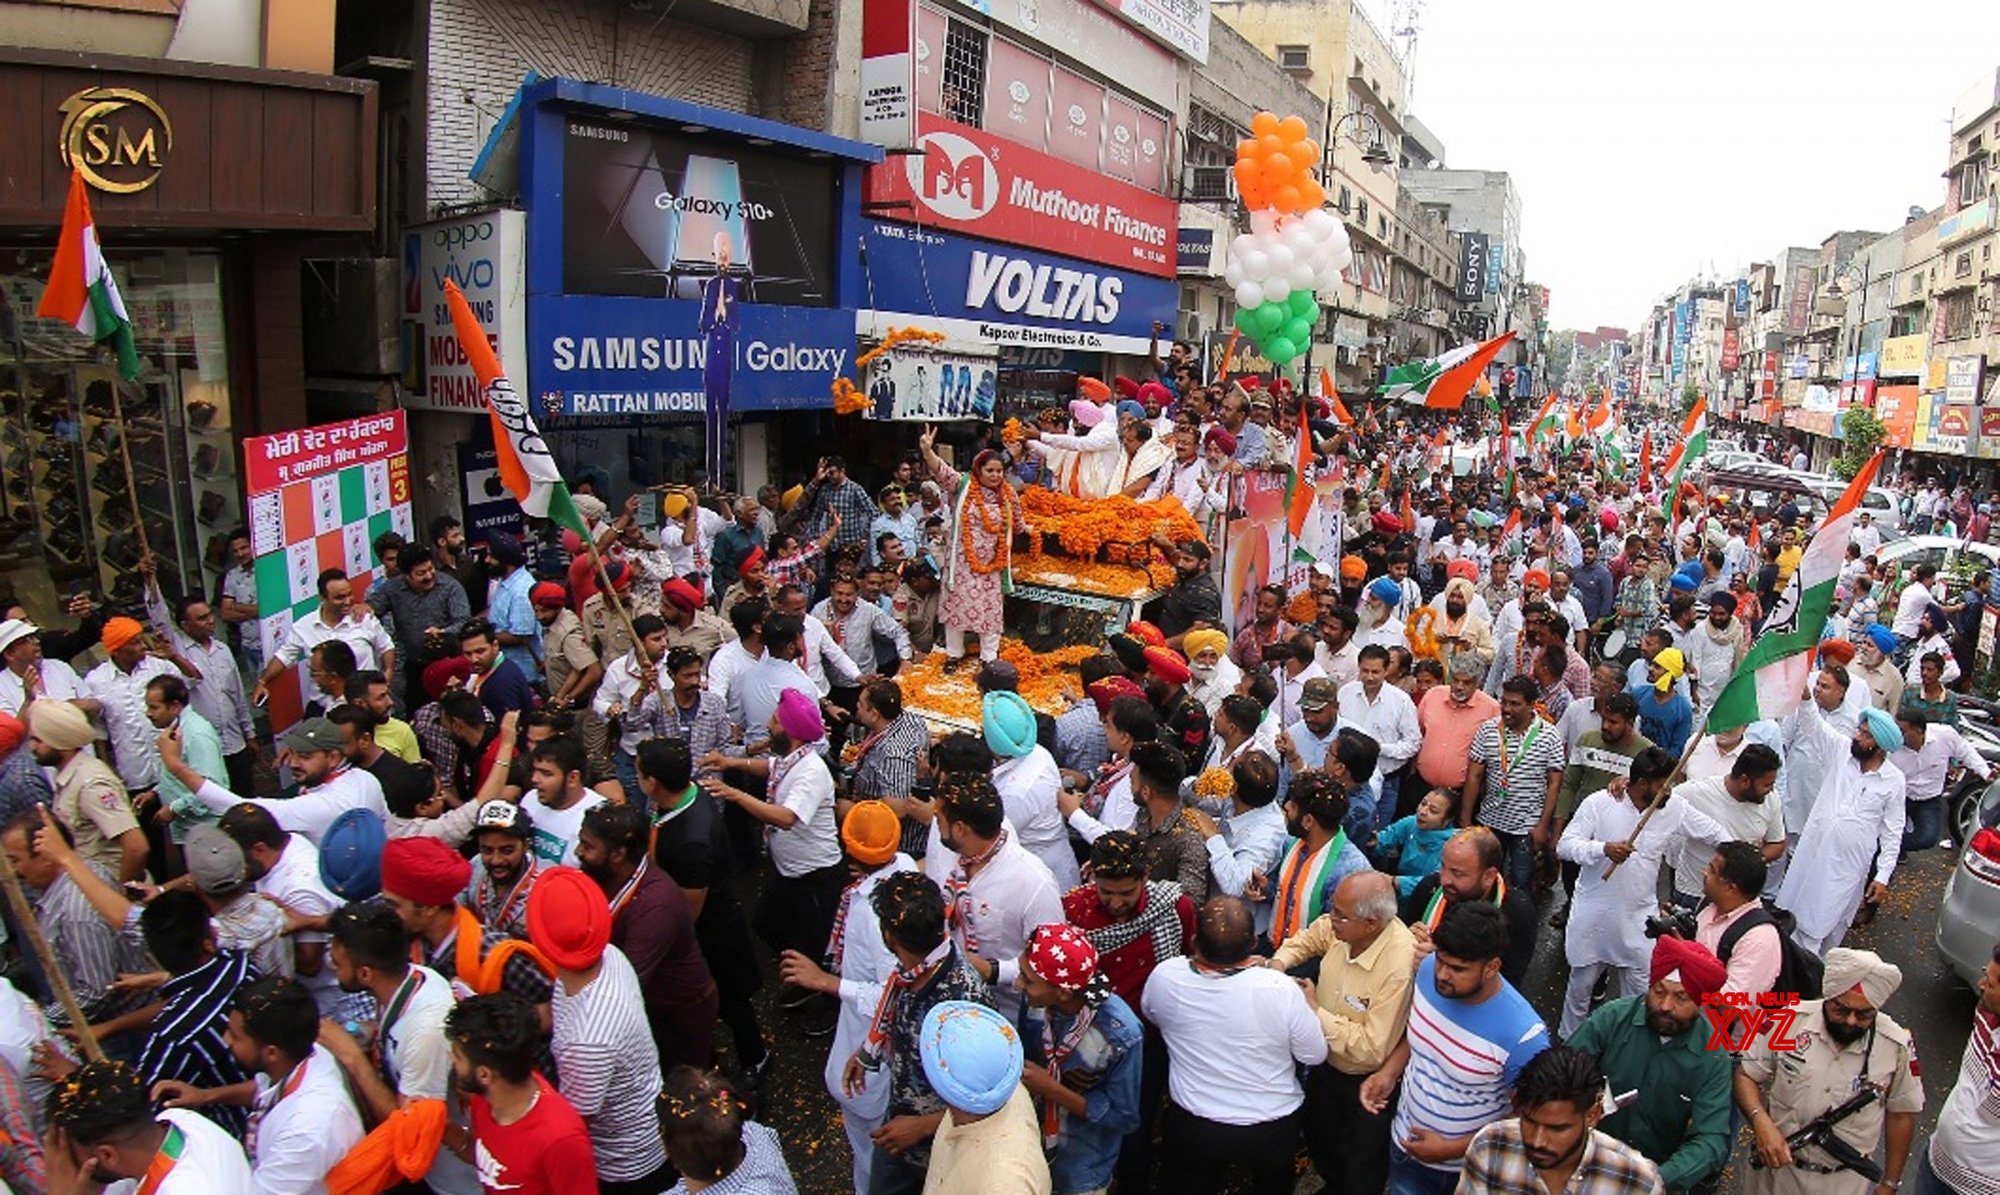 Amritsar: 2019 Lok Sabha elections - Gurjeet Singh Aujla, Raj Kumar Verka during a roadshow #Gallery